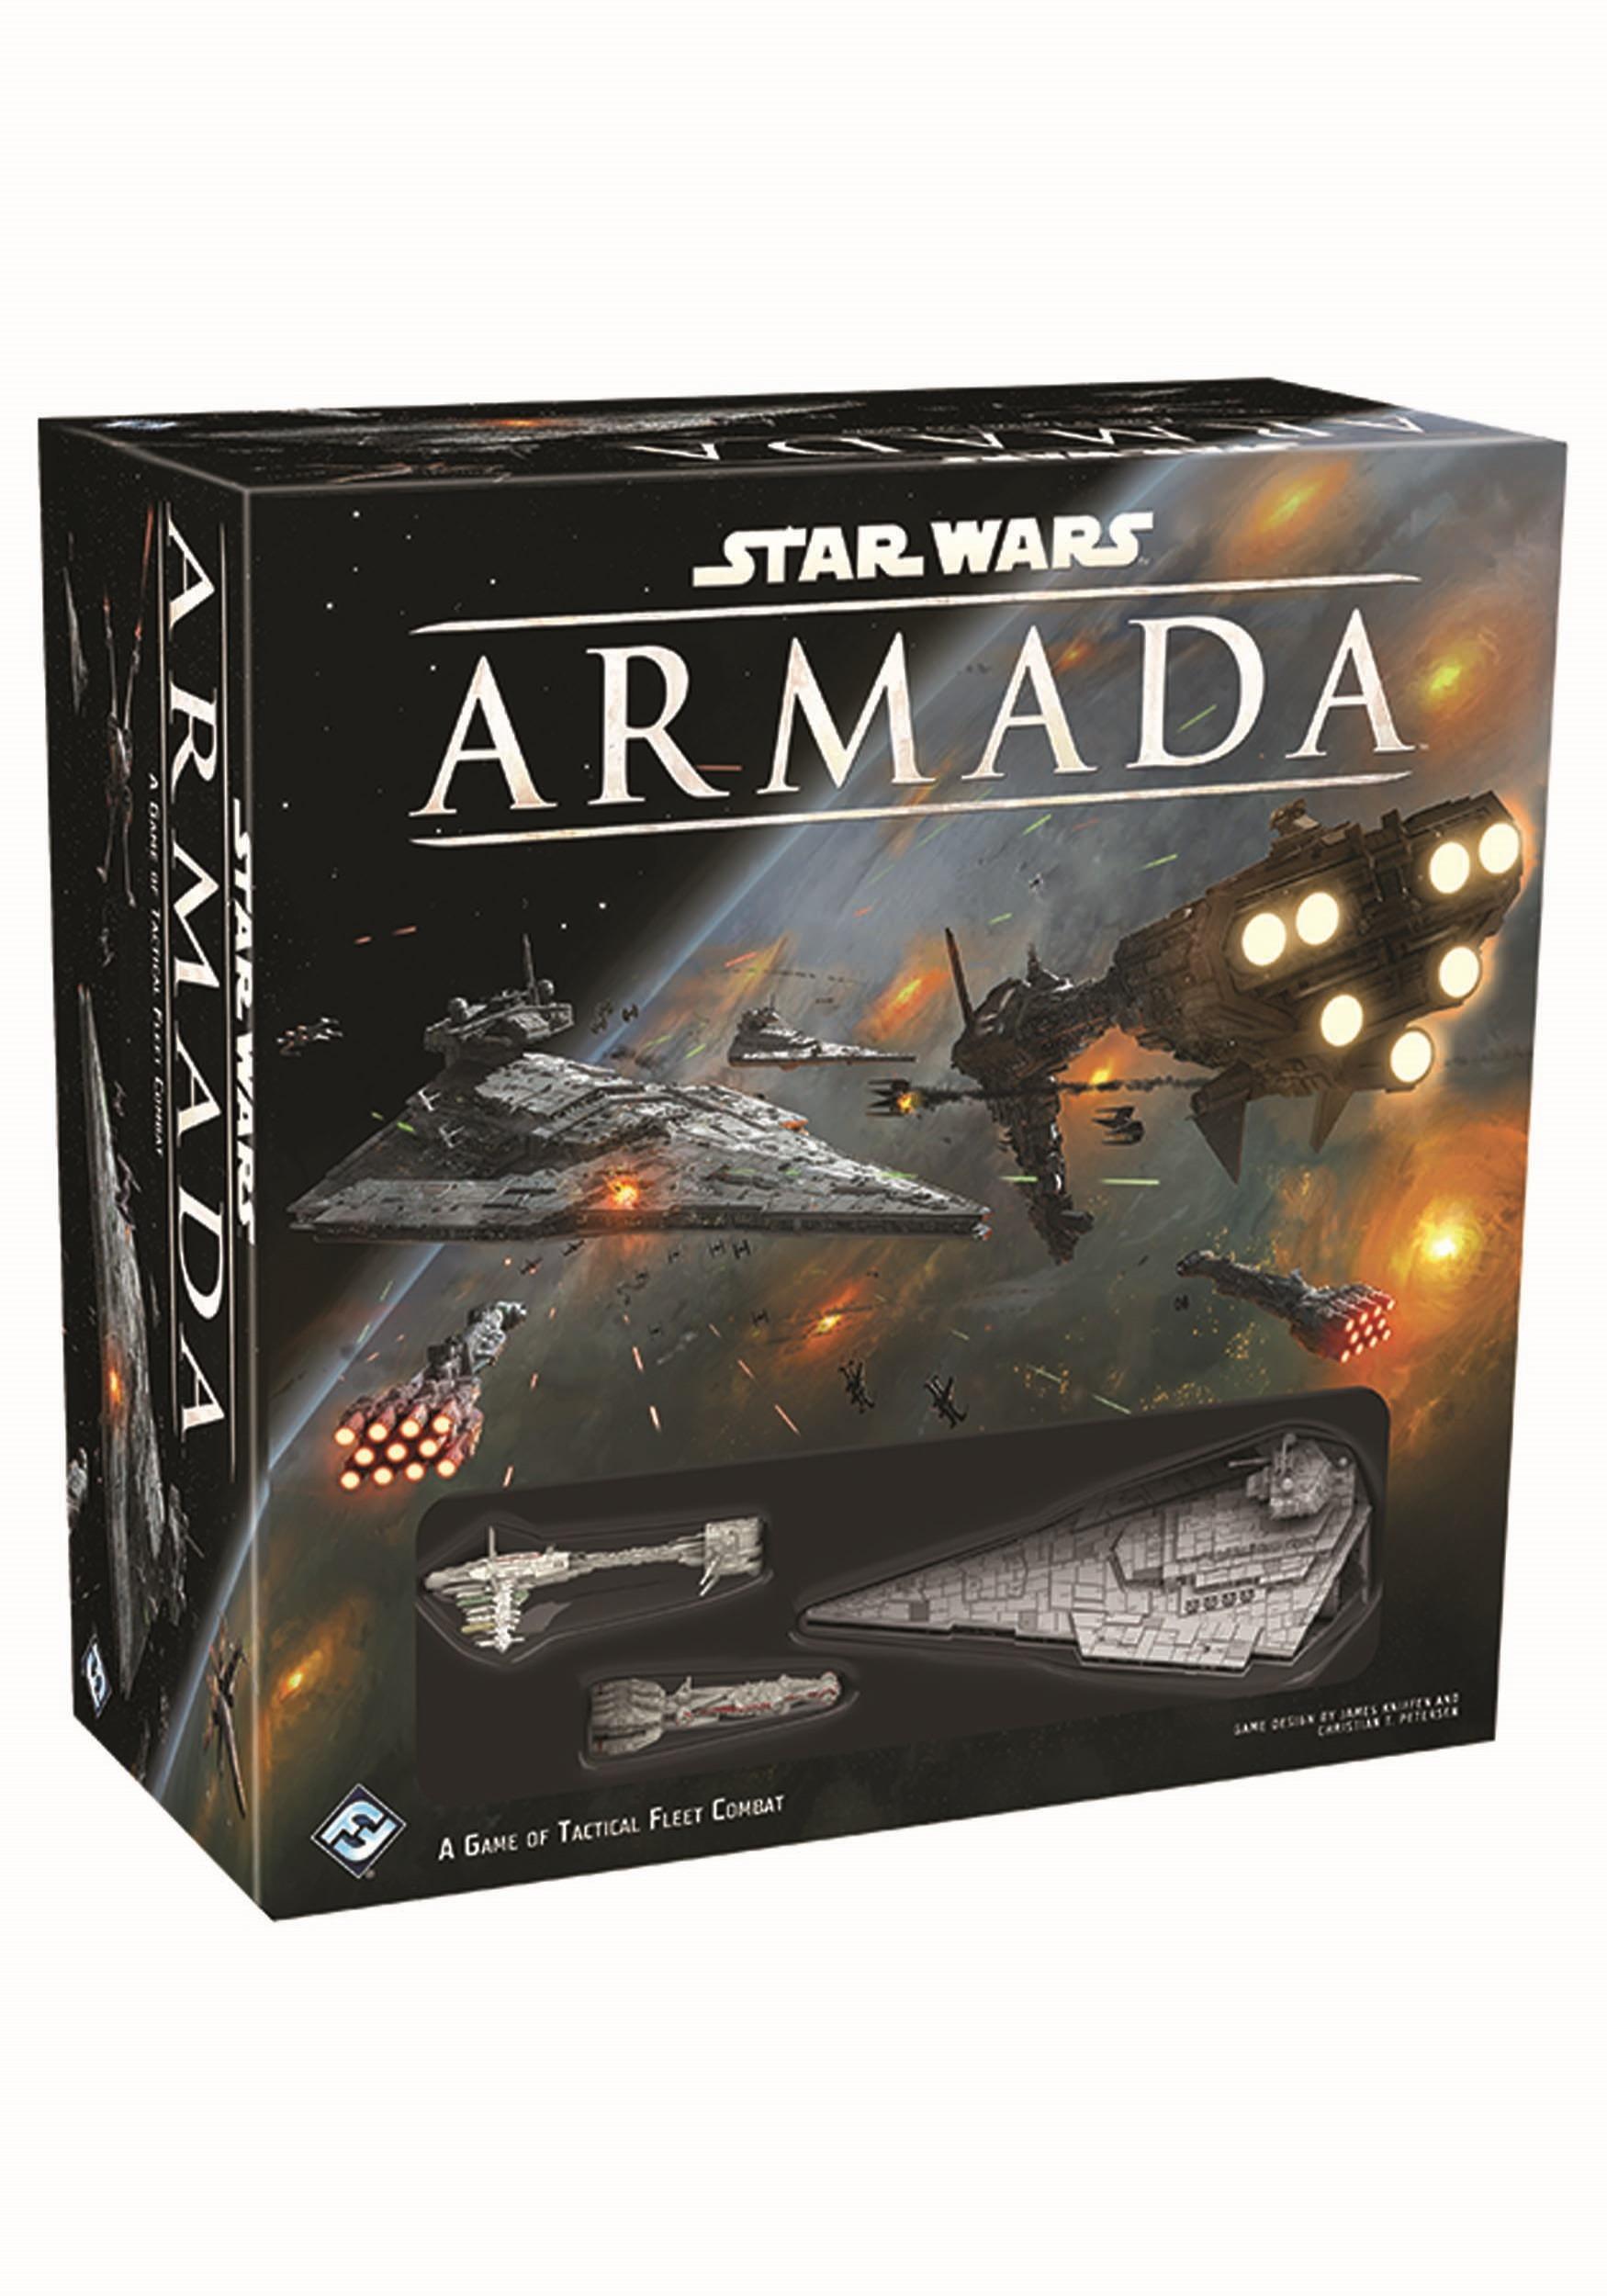 Star Wars Armada Miniatures Board Game Core Set